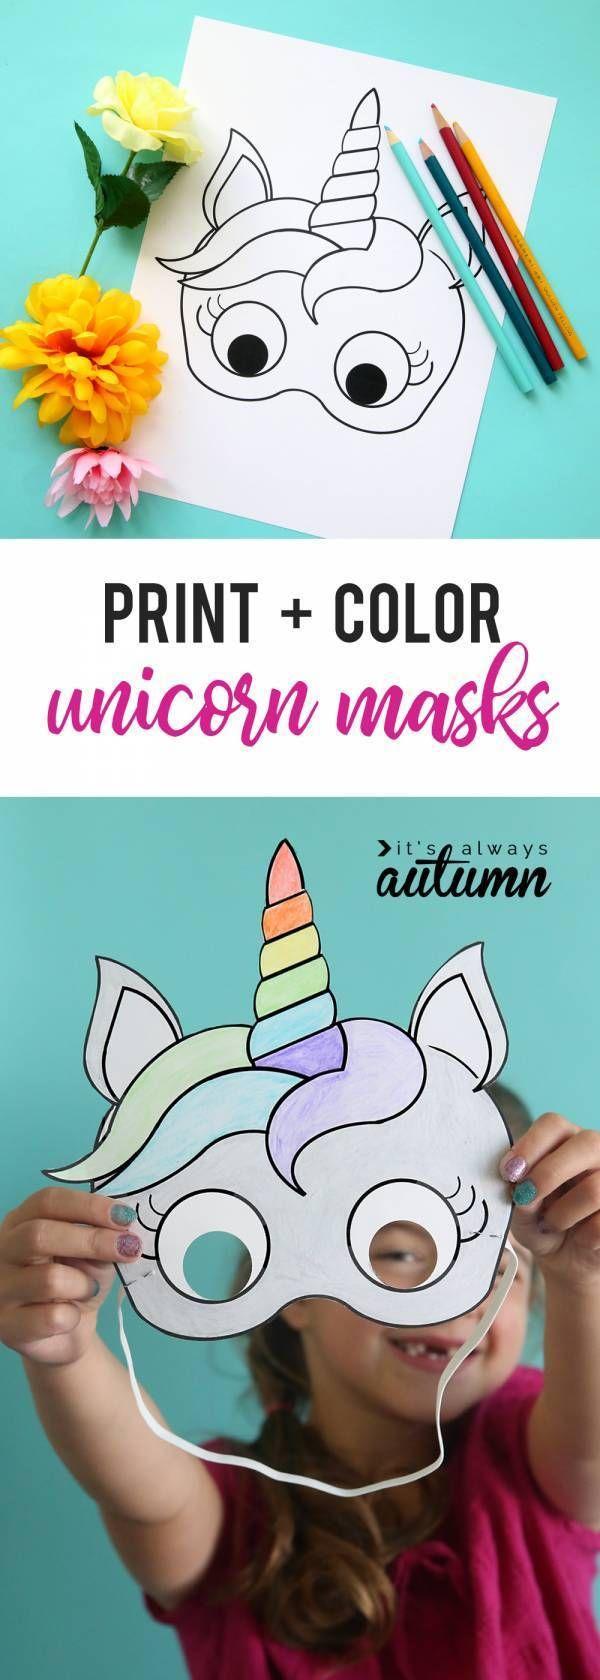 DIY   Unicorn Masks to Print and Color #unicorncrafts